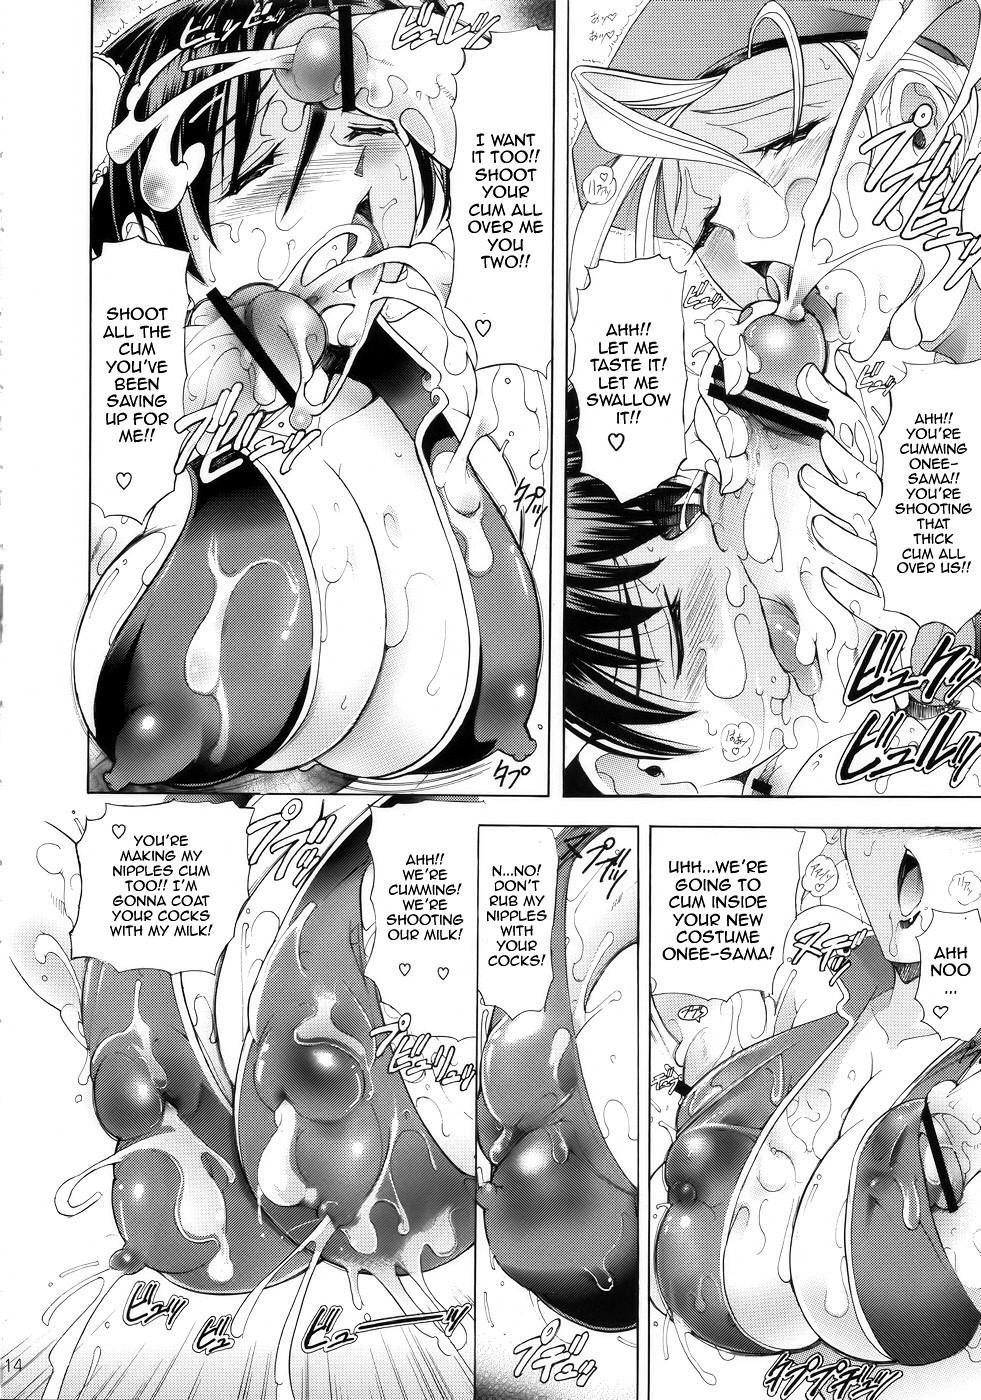 (C75) [Kawaraya Honpo (Kawaraya A-ta)] Hana - Maki no Juunana - Housenka (Street Fighter) [English] [Yuribou] 12